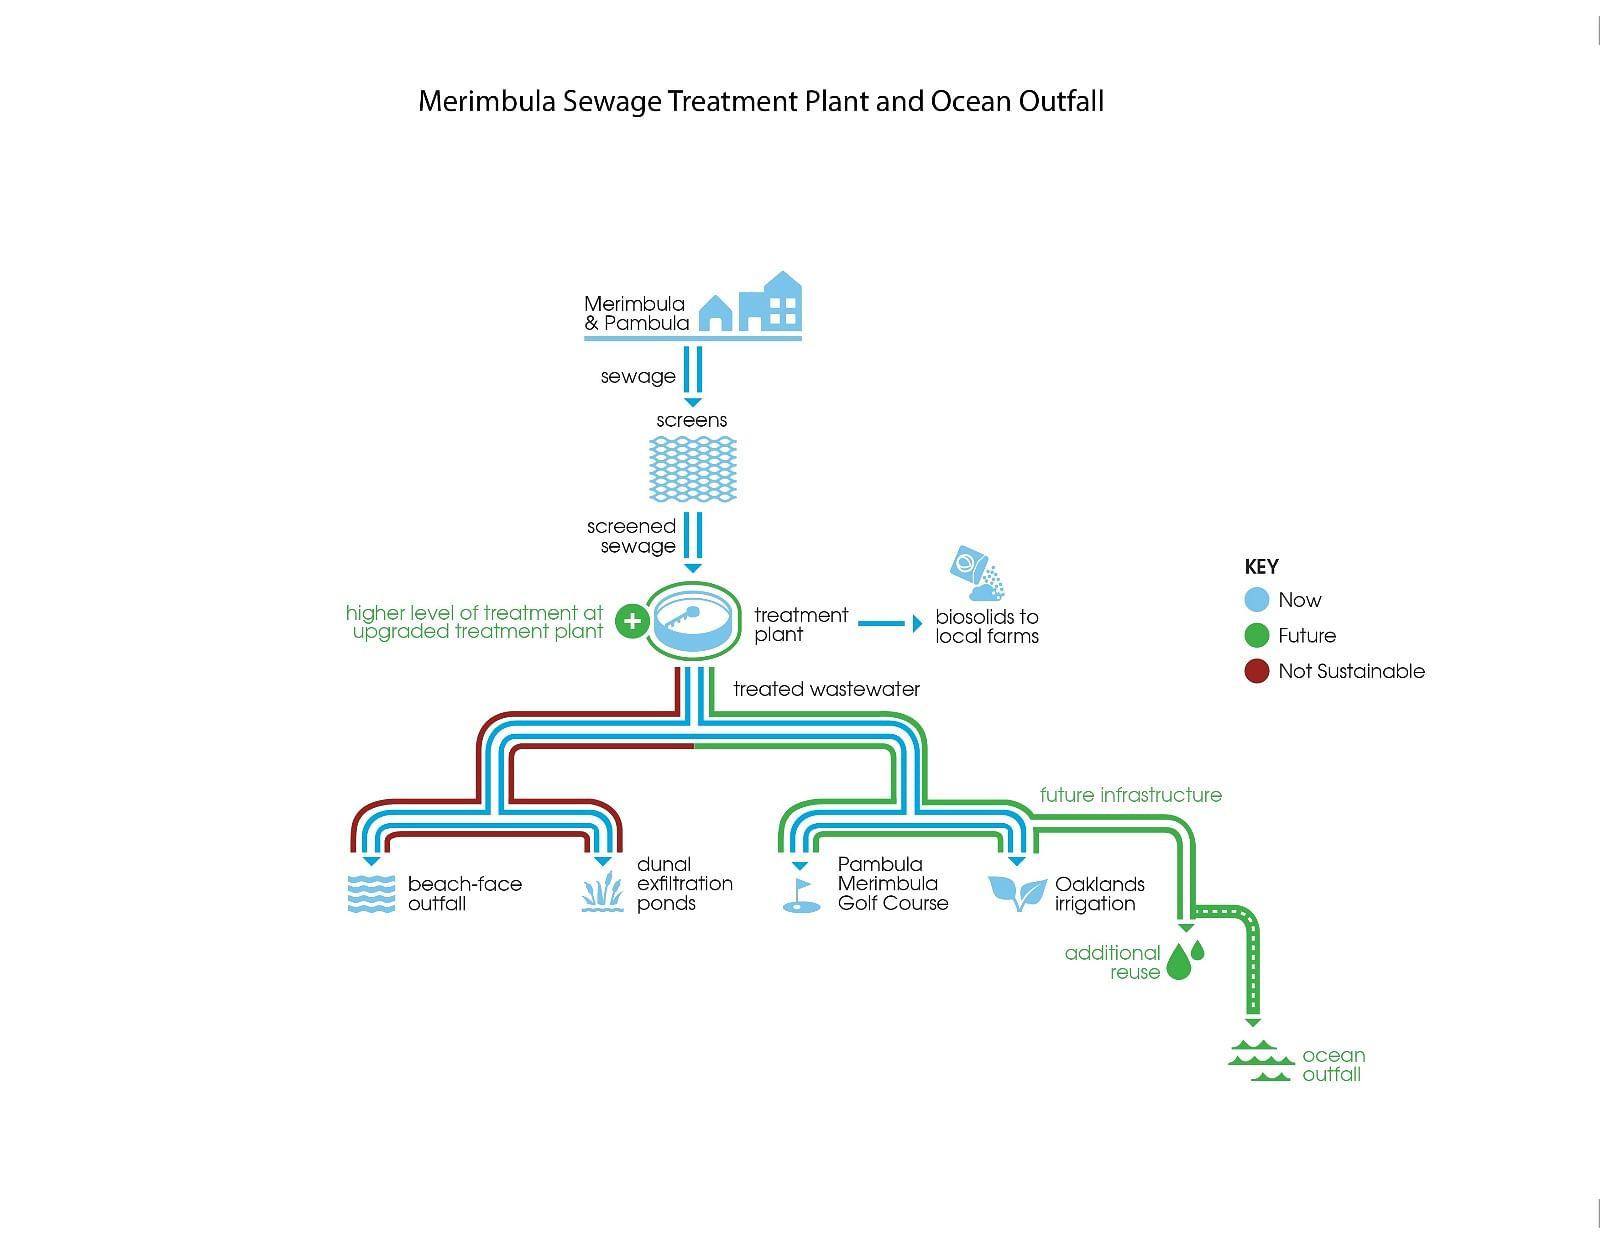 Diagram of Merimbula Sewage Treatment Plant and Ocean Outfall